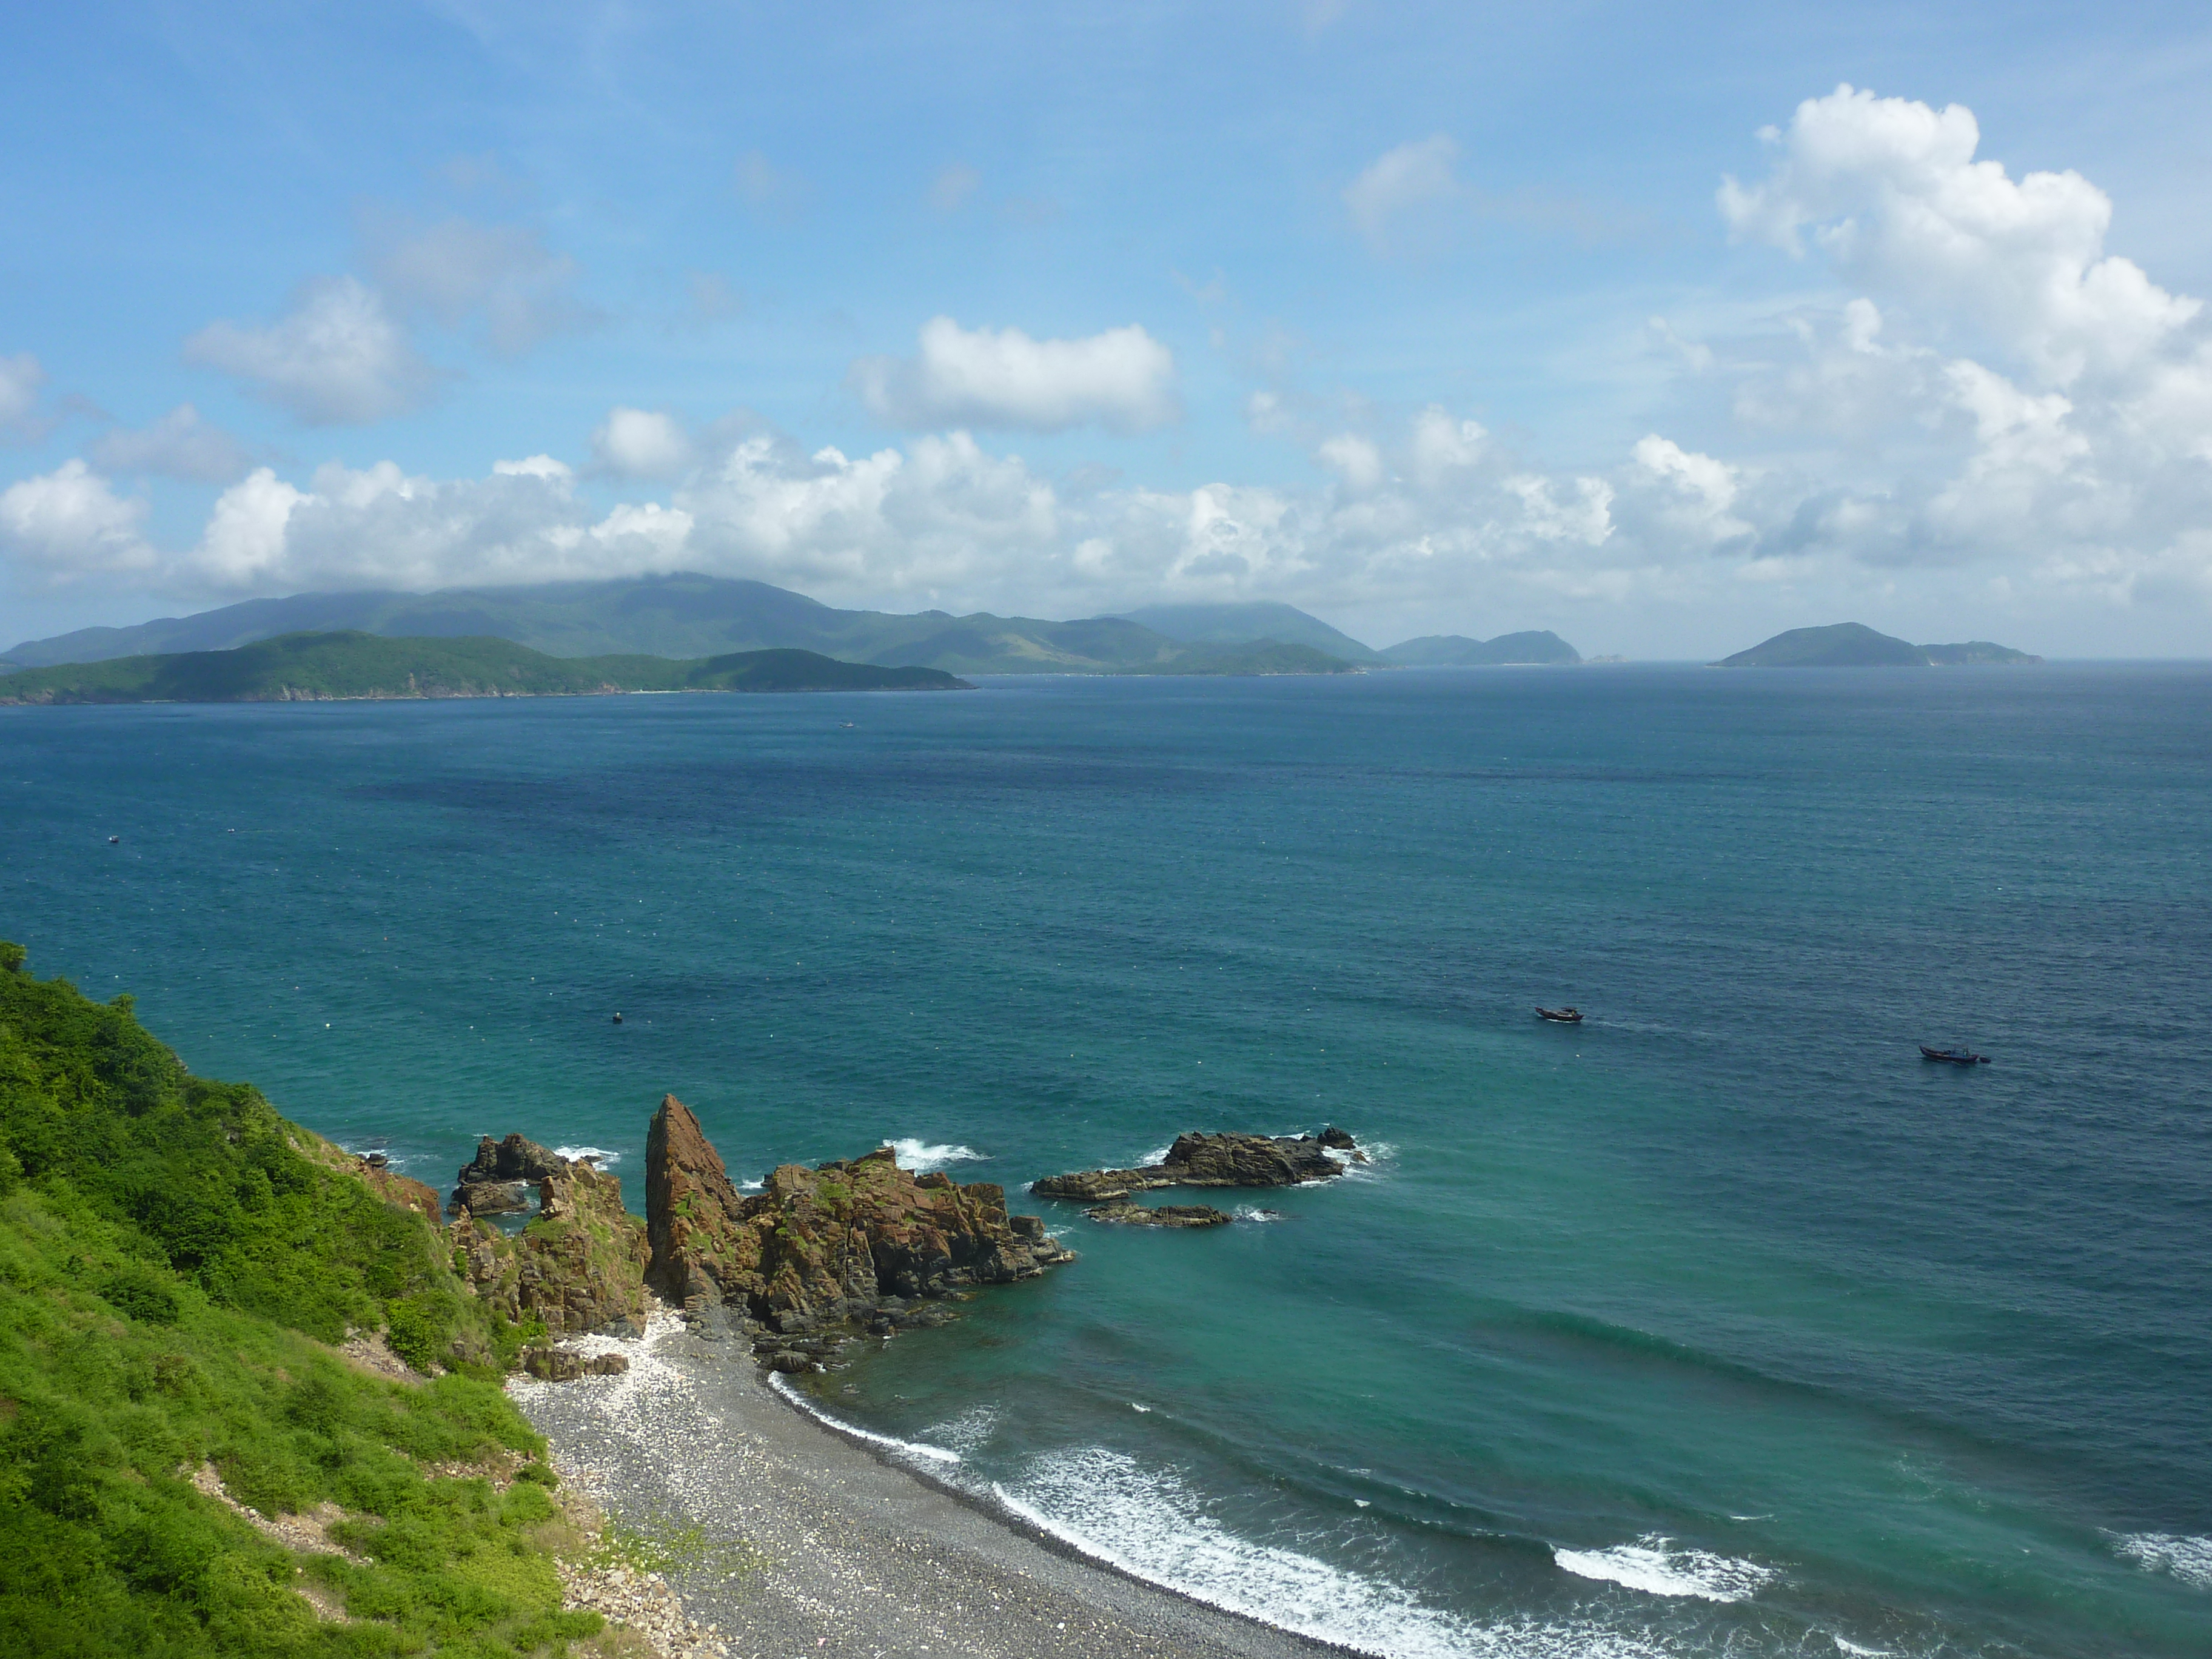 Coastline South of Nha Trang